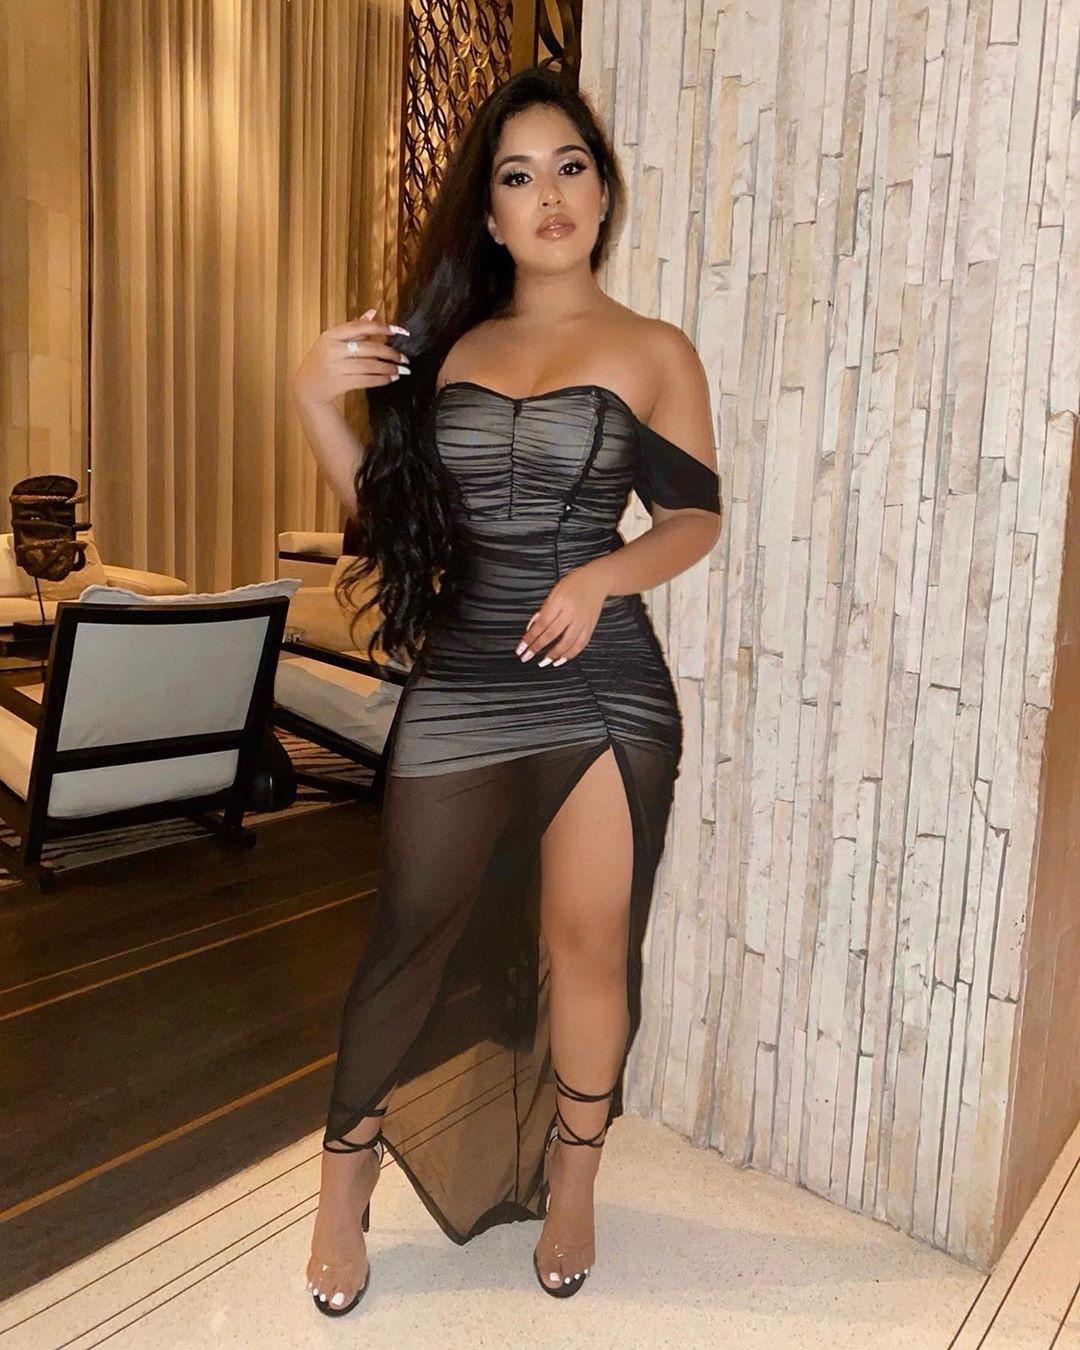 Sadey Ali dress outfit ideas, instagram photoshoot, hot legs